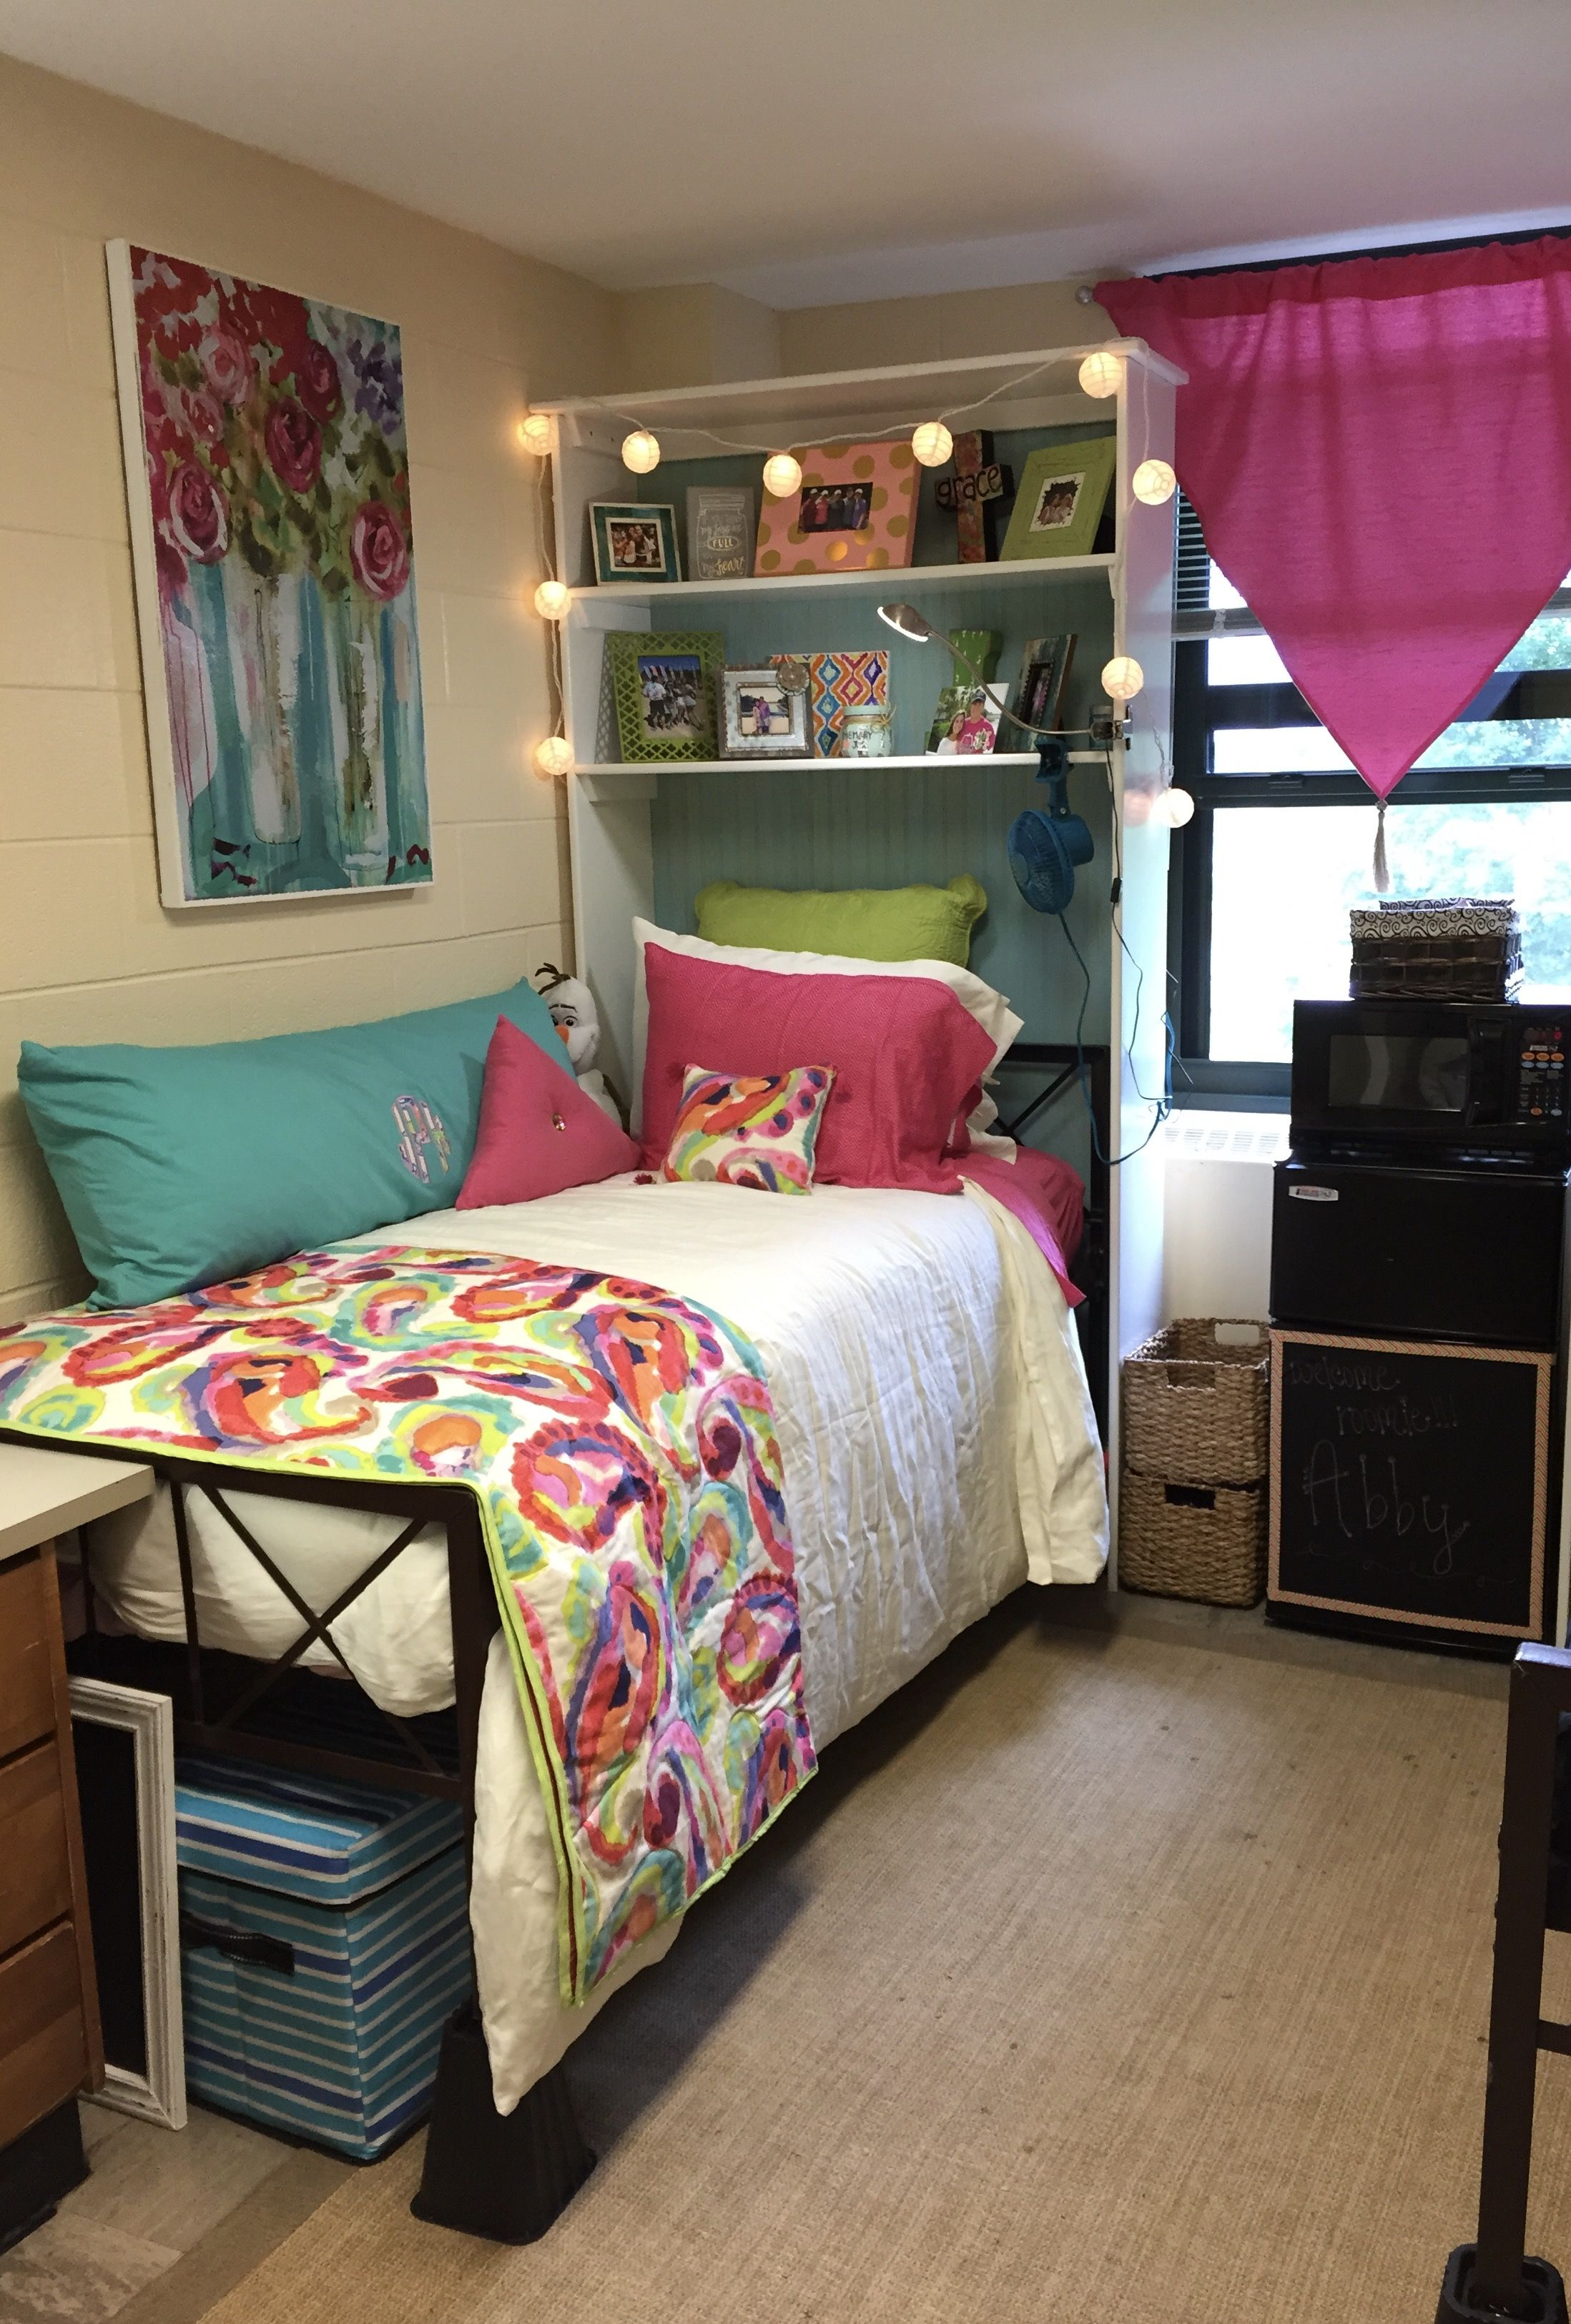 Dorm Room Headboards: Dorm Room Appalachian State University #headboard